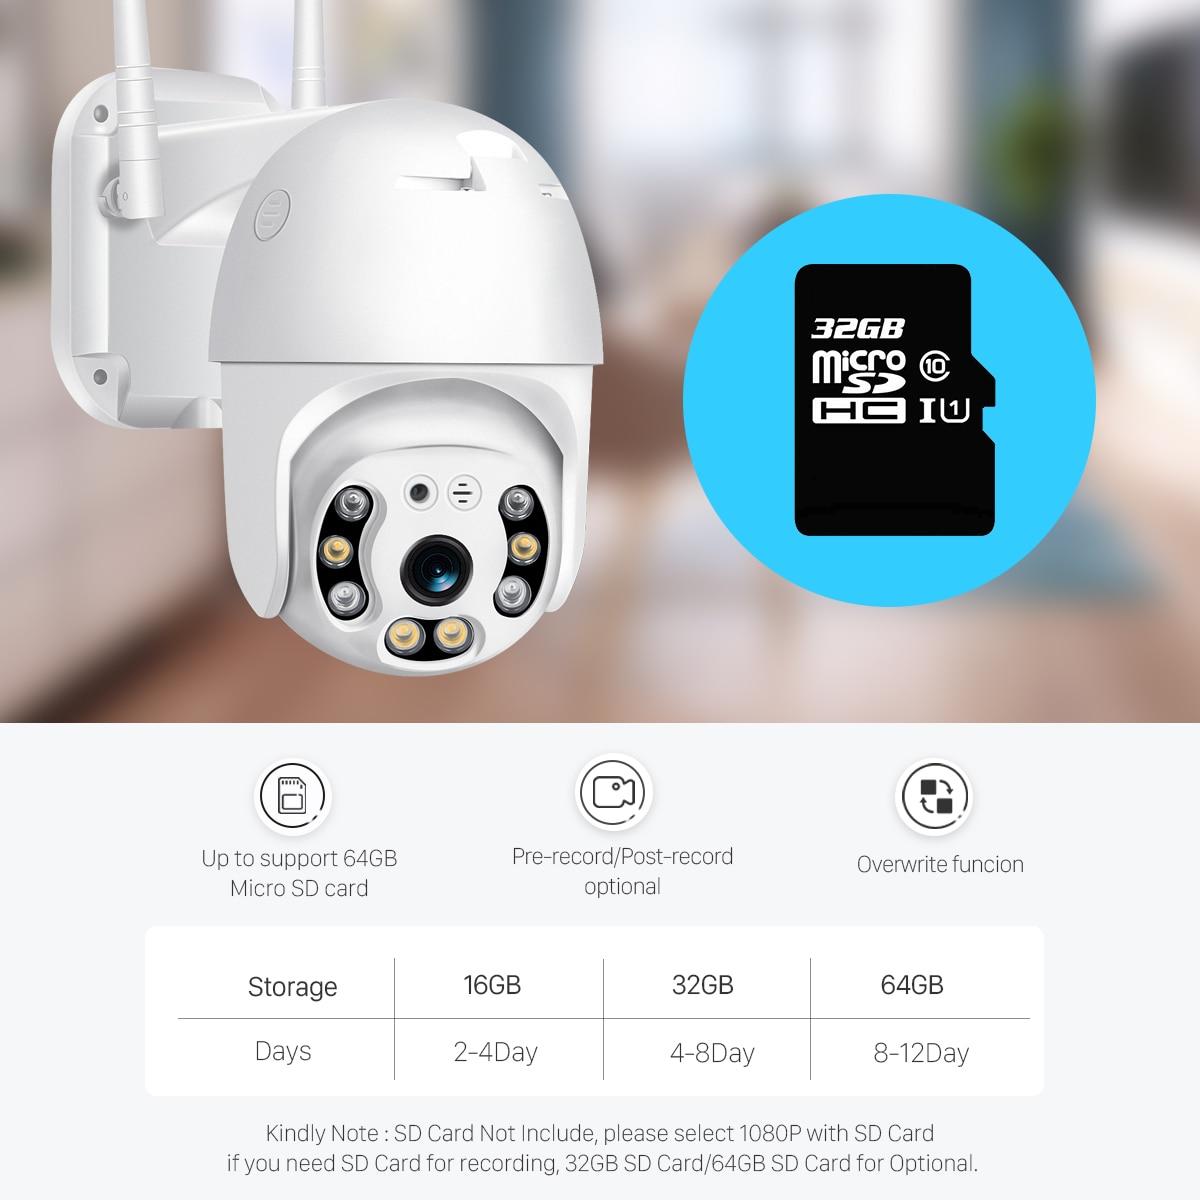 H42672417c7cd41eb95c26342482ed5b17 BESDER 1080P Outdoor Speed Dome Wifi Camera 2MP H.265 Audio PTZ Wireless Camera Cloud-SD Slot ONVIF Home Surveillance IP Camera